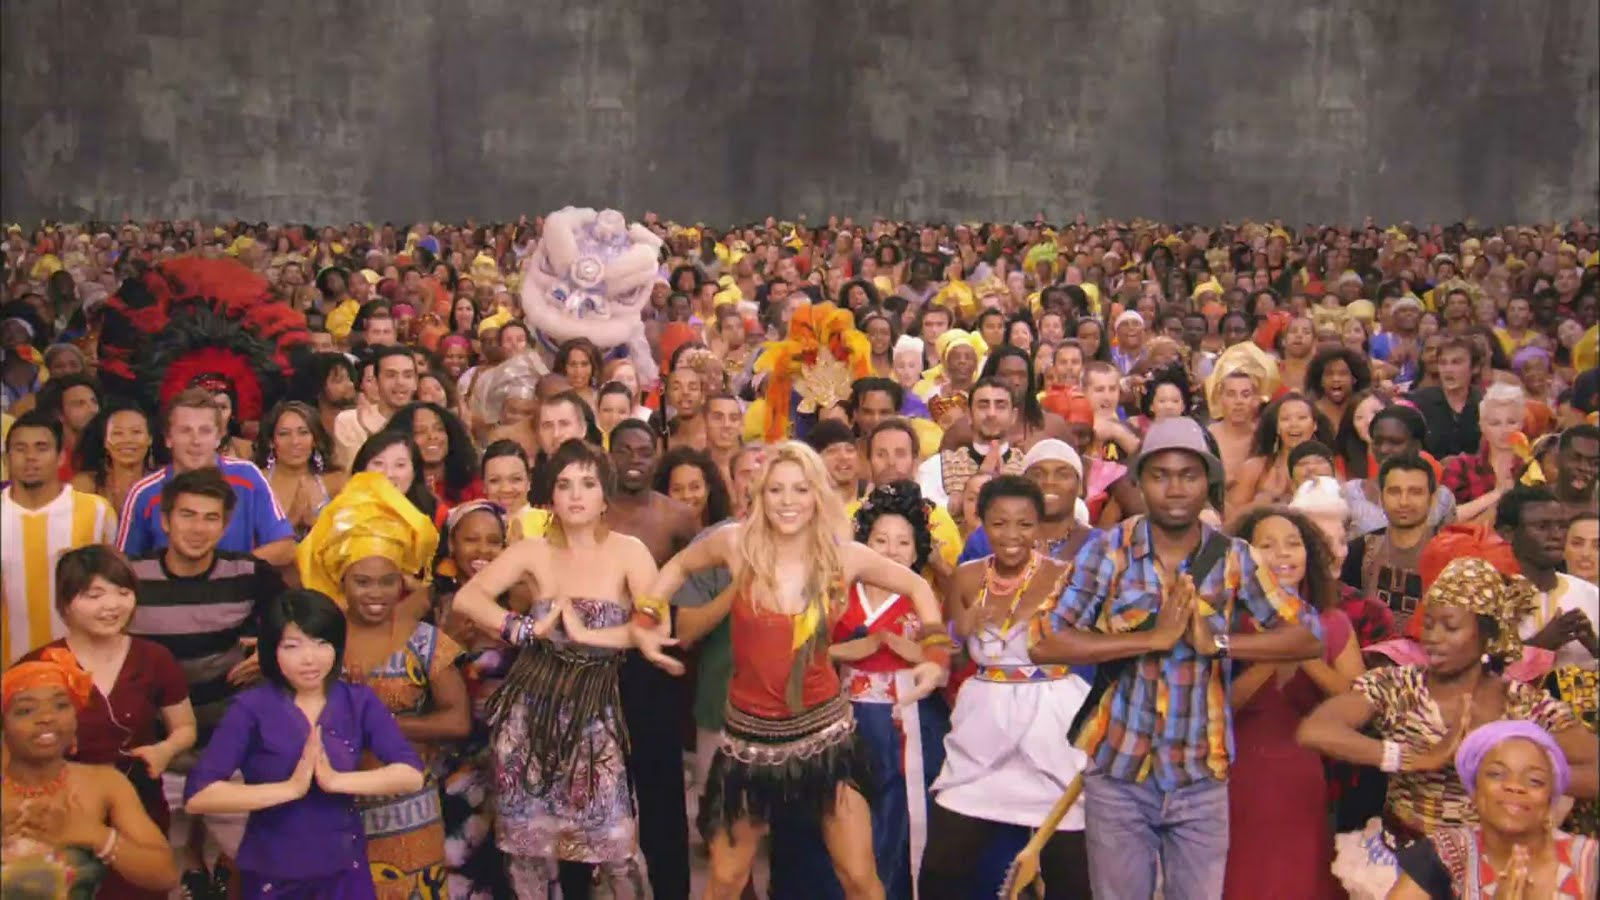 Шакира вака вака, Shakira - Waka Waka (FifaWorld Cup) - скачать 2 фотография